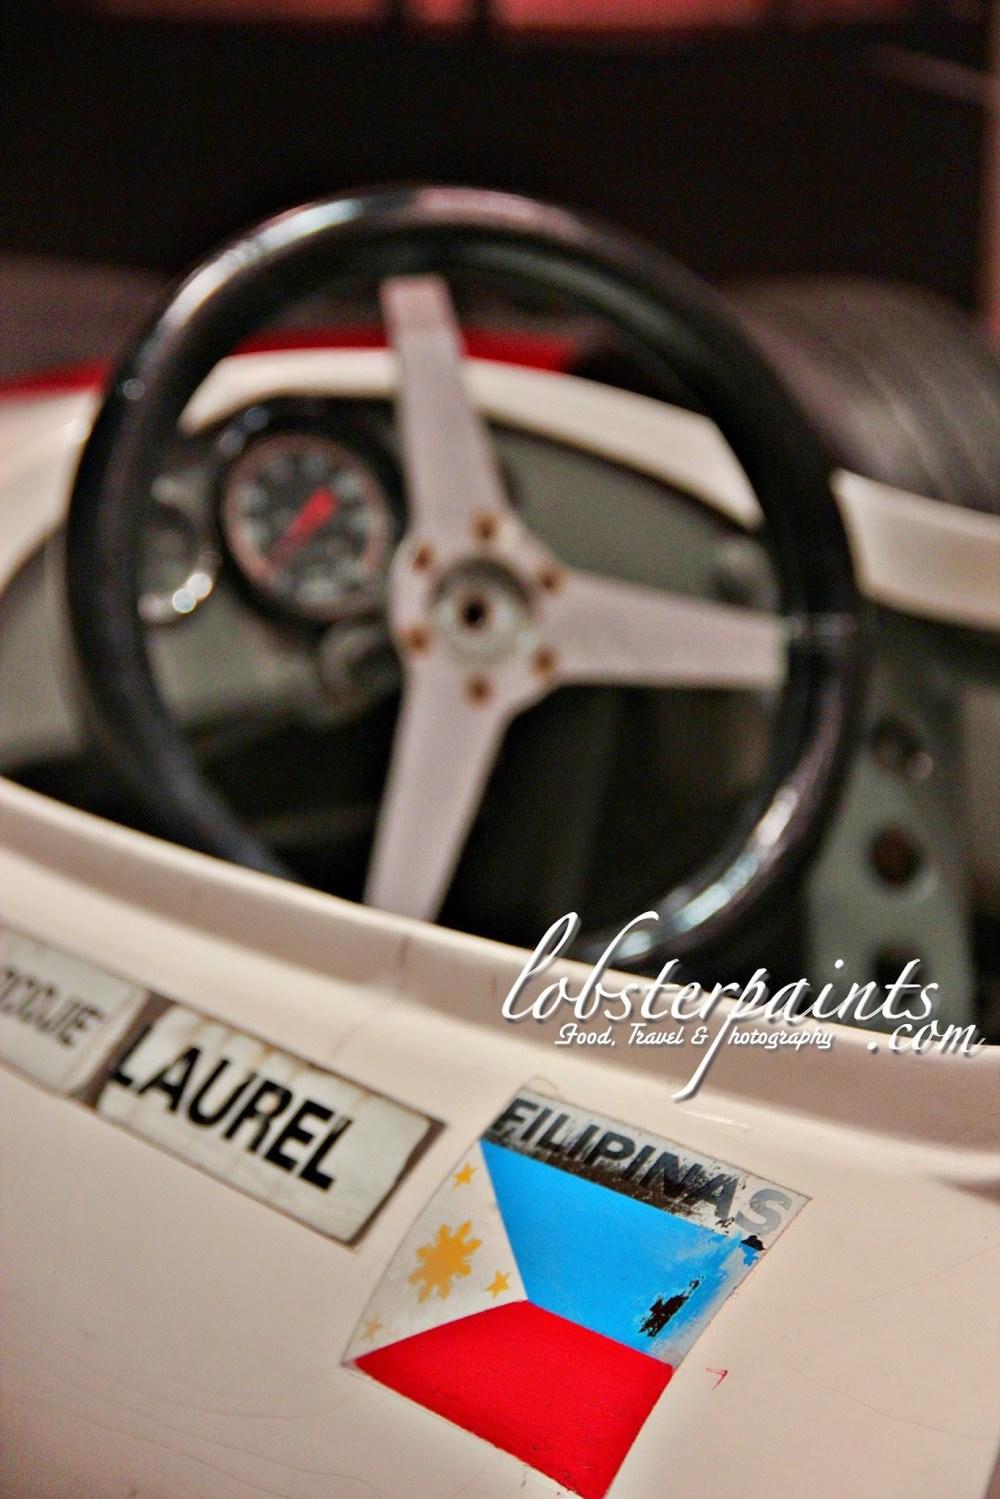 Grand Prix Museum 大賽車博物館 | Macau, China